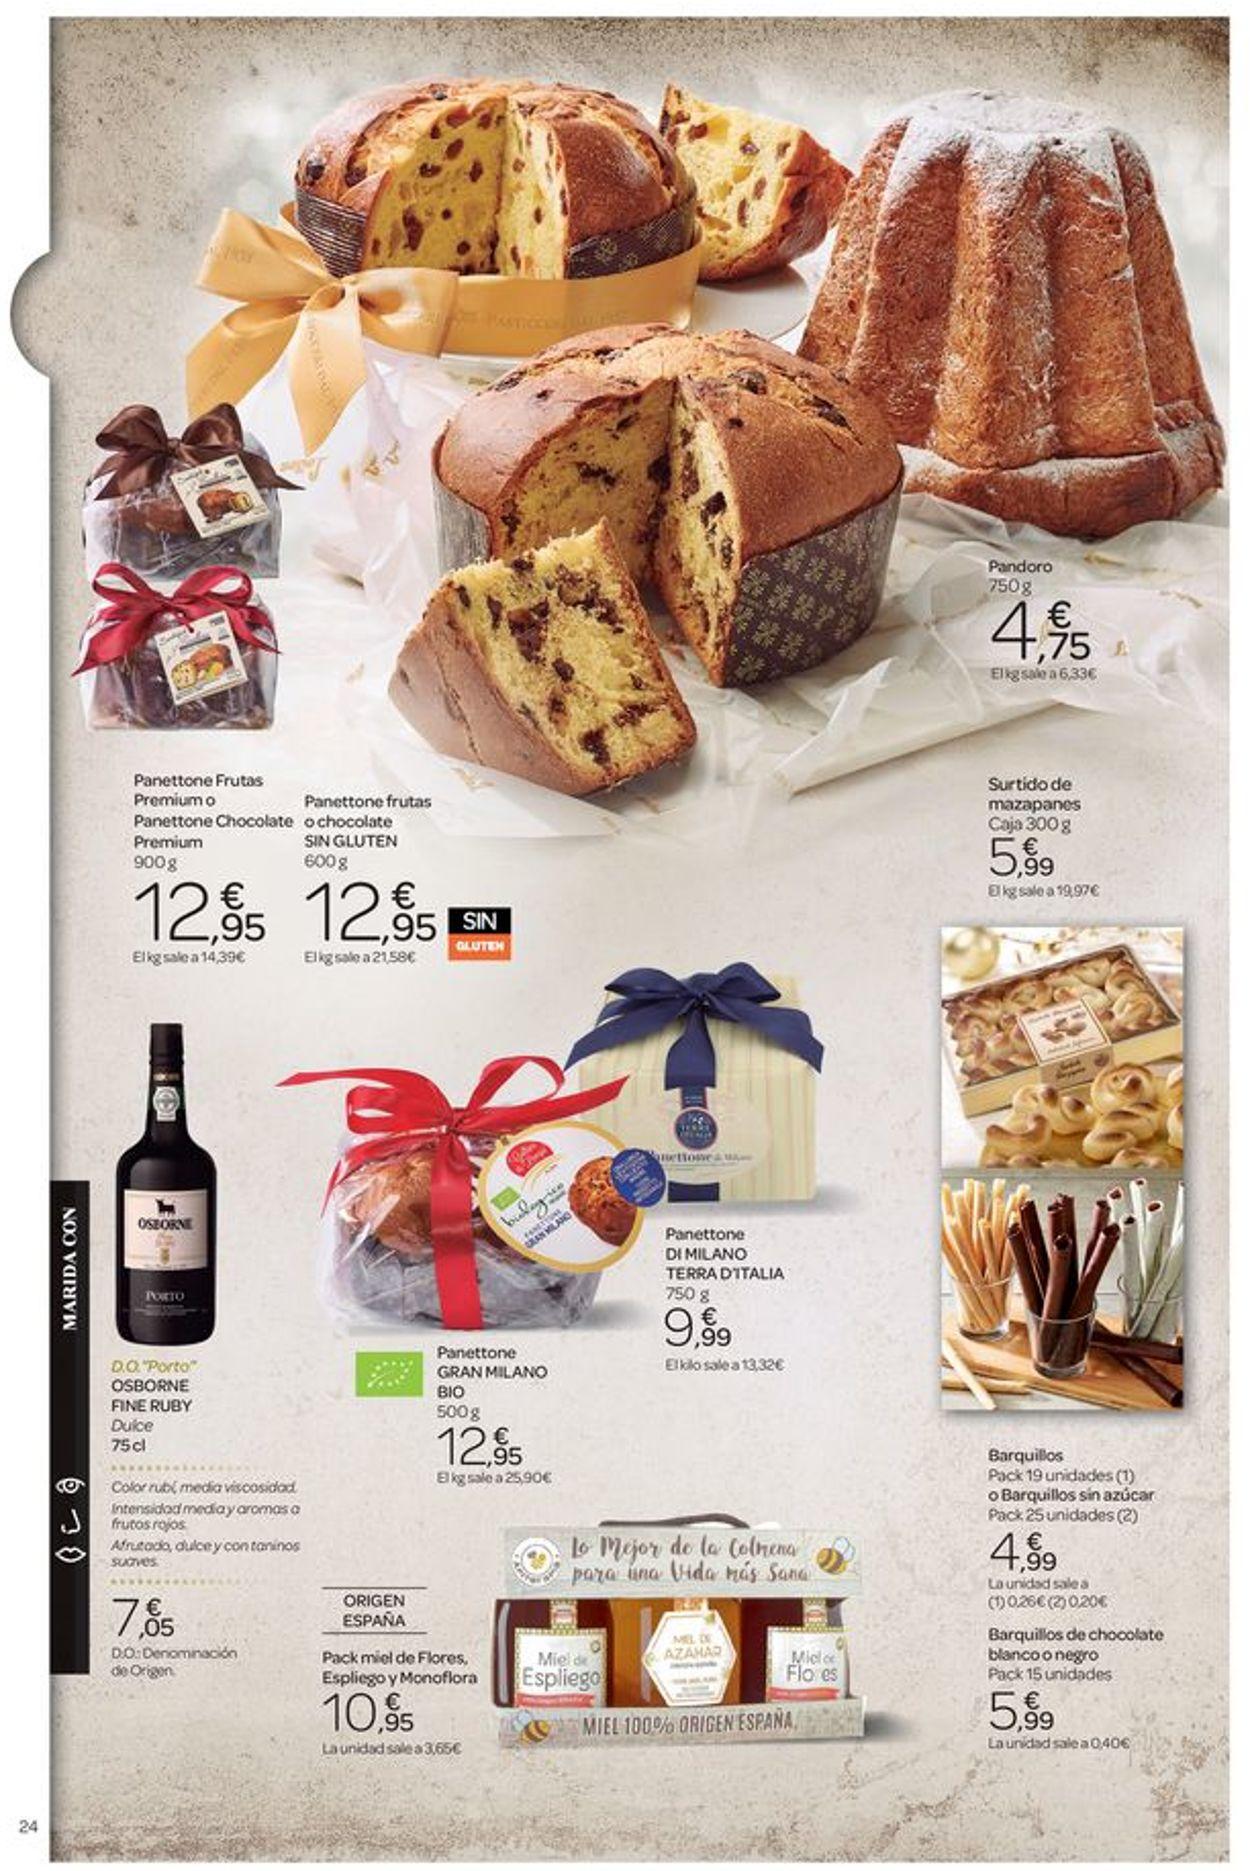 Carrefour Folleto - 03.12-31.12.2019 (Página 24)